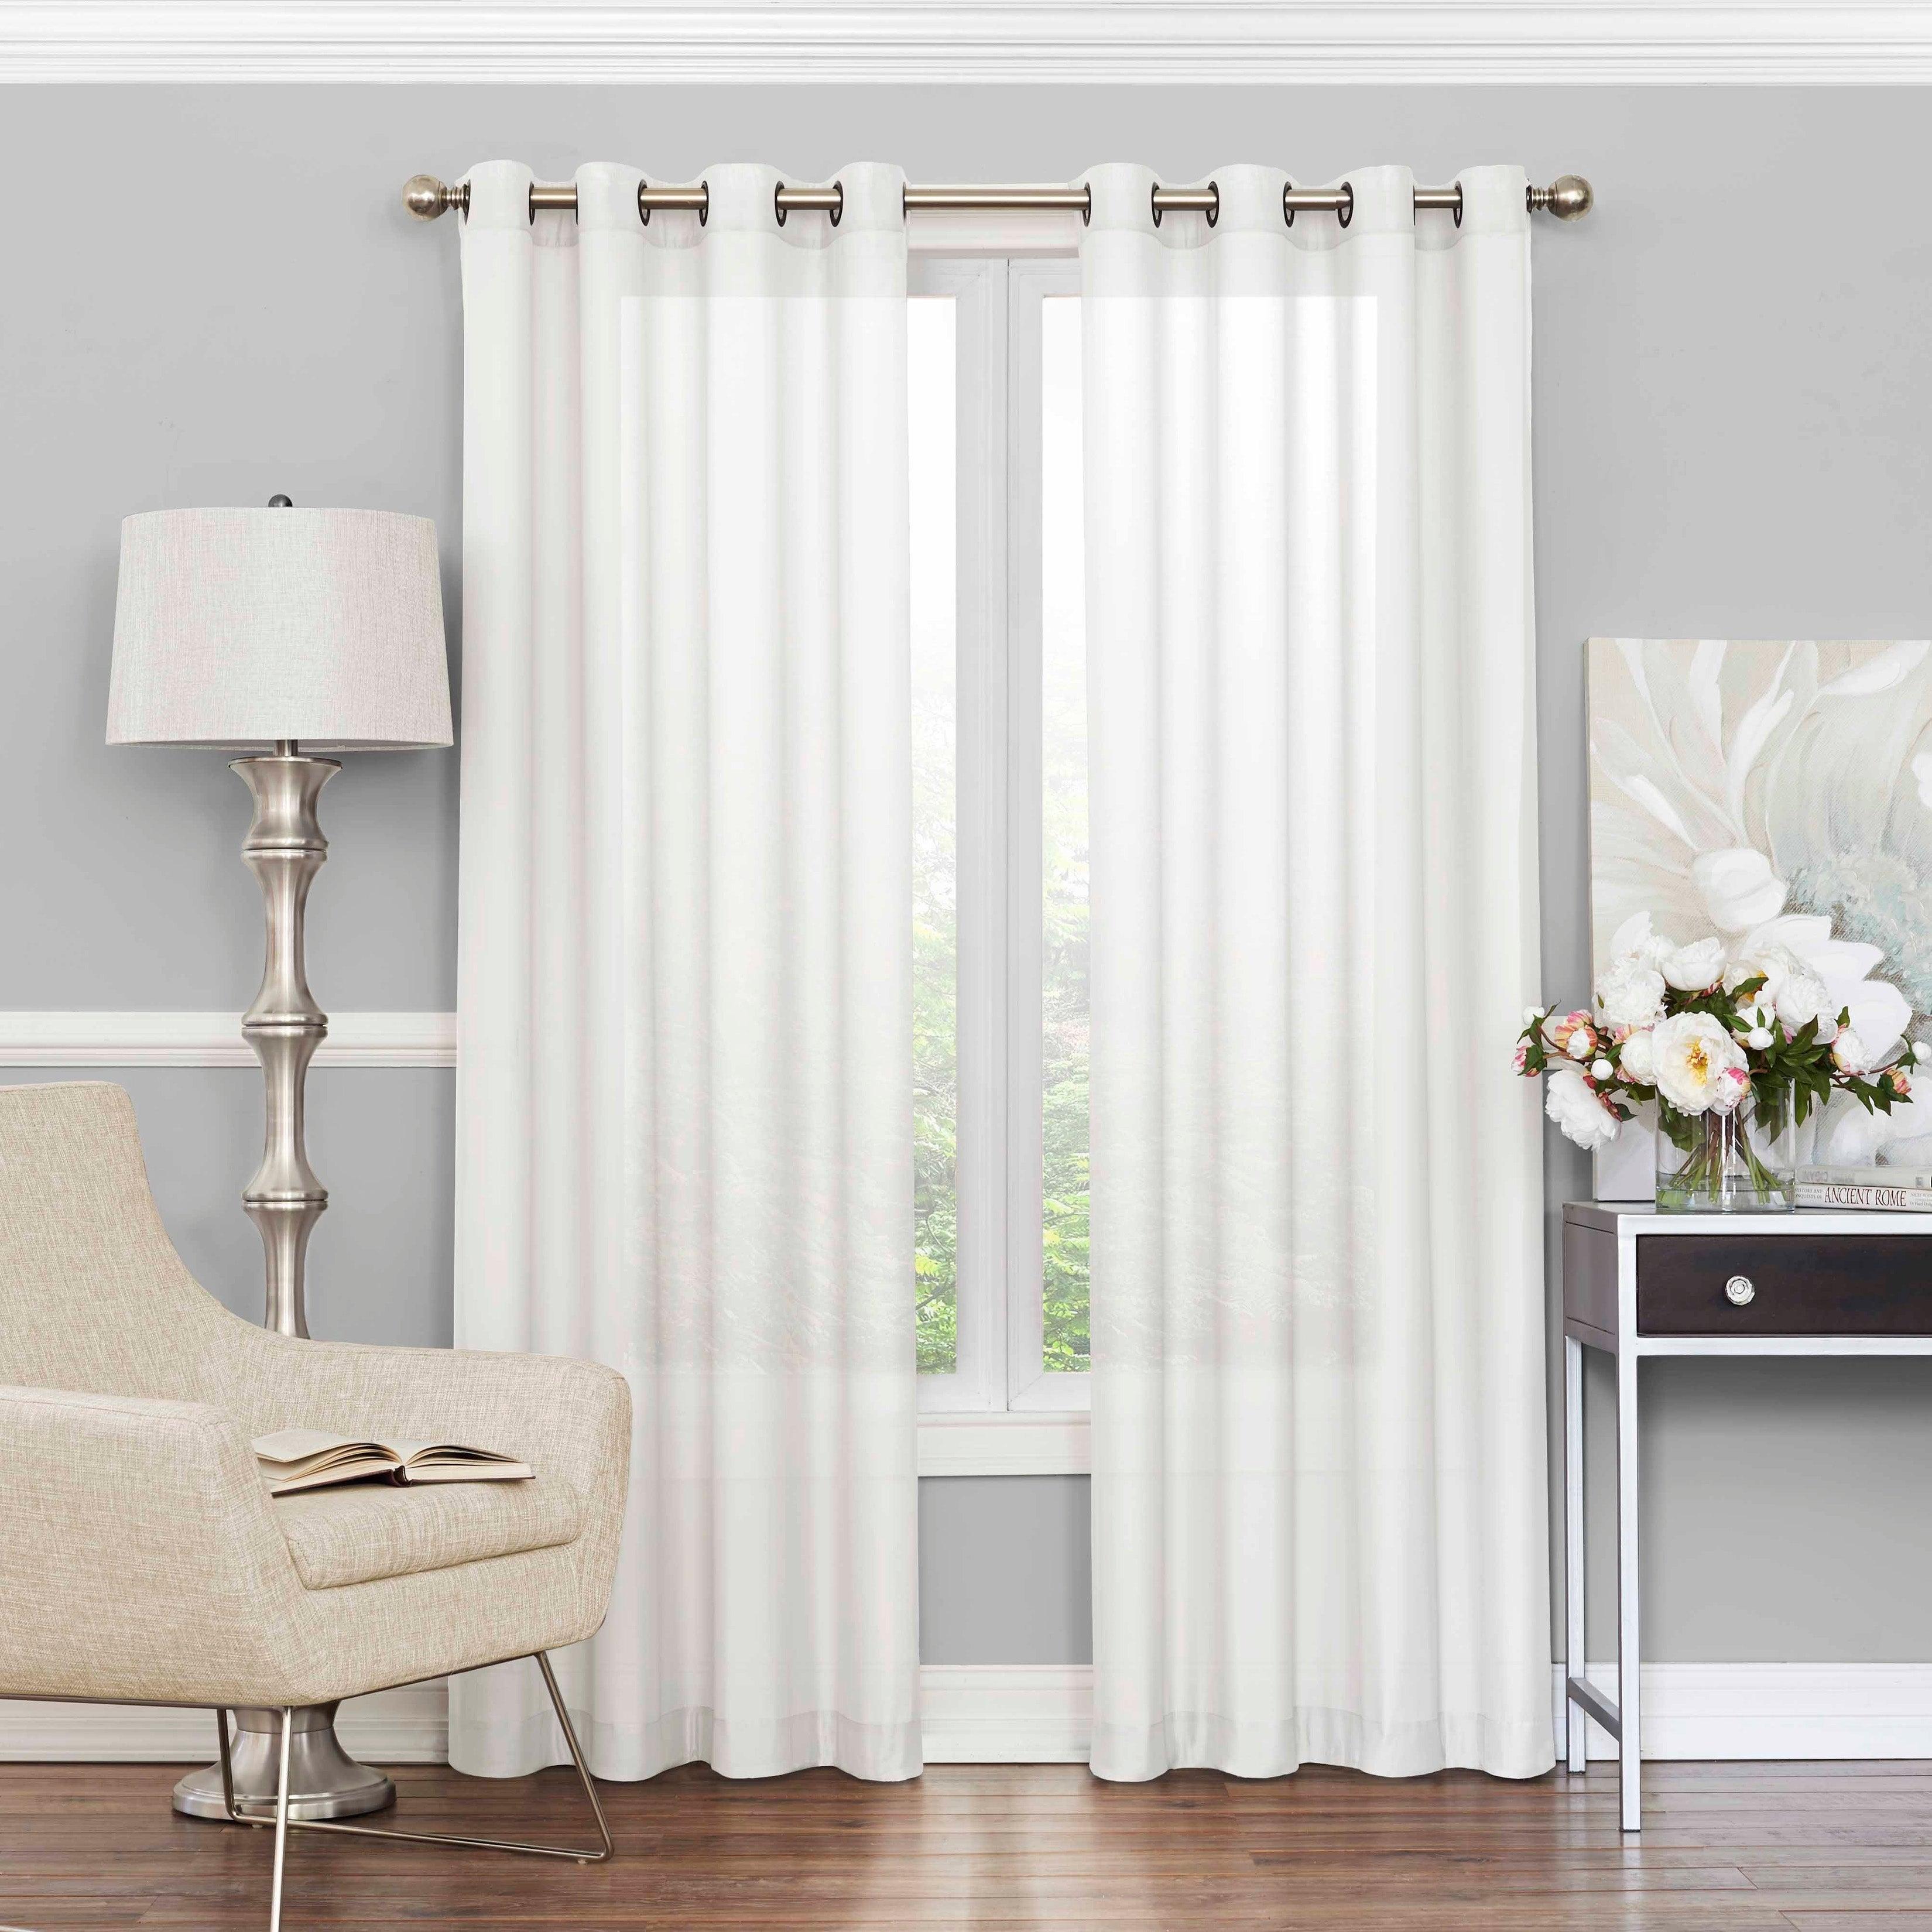 Eclipse Liberty Light Filtering Sheer Single Curtain Panel With Regard To Light Filtering Sheer Single Curtain Panels (View 3 of 20)